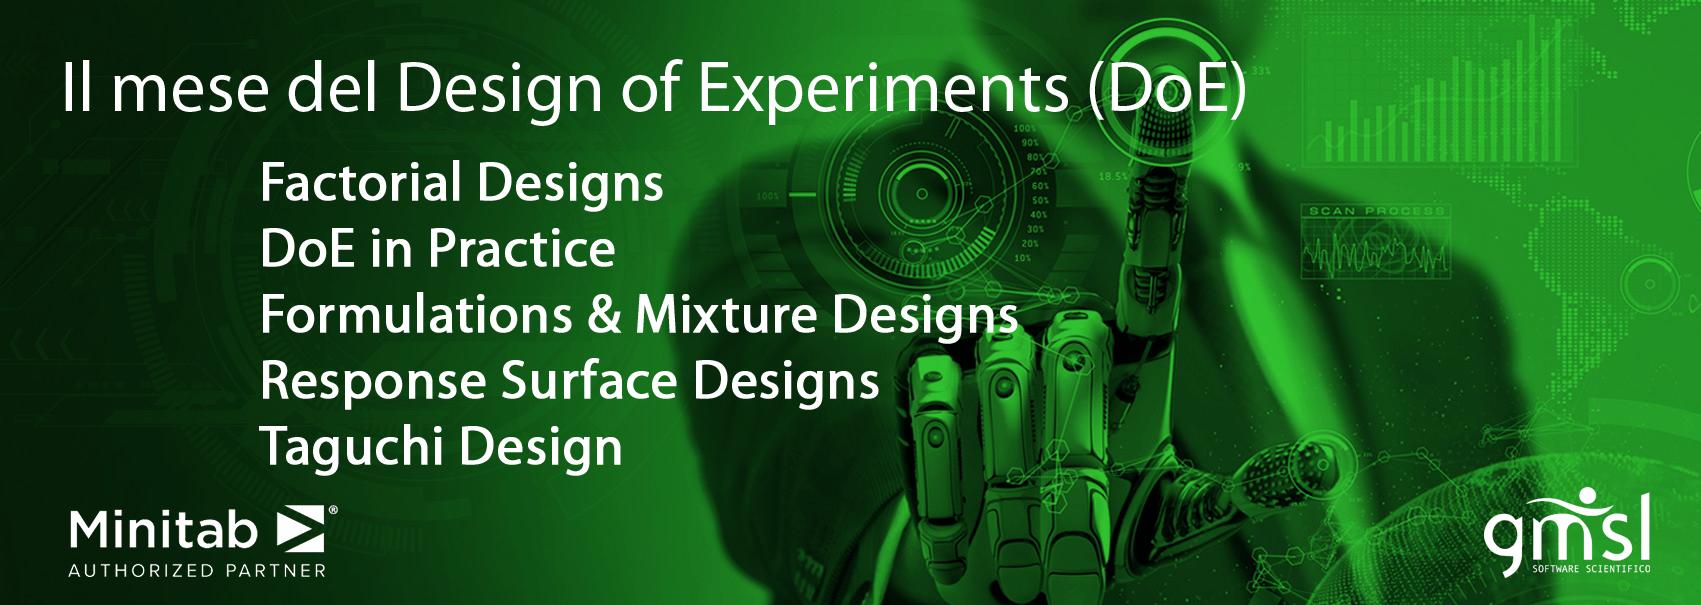 MeseDoE Minitab | CORSI UFFICIALI MINITAB - Il mese del Design Of Experiments (DoE)